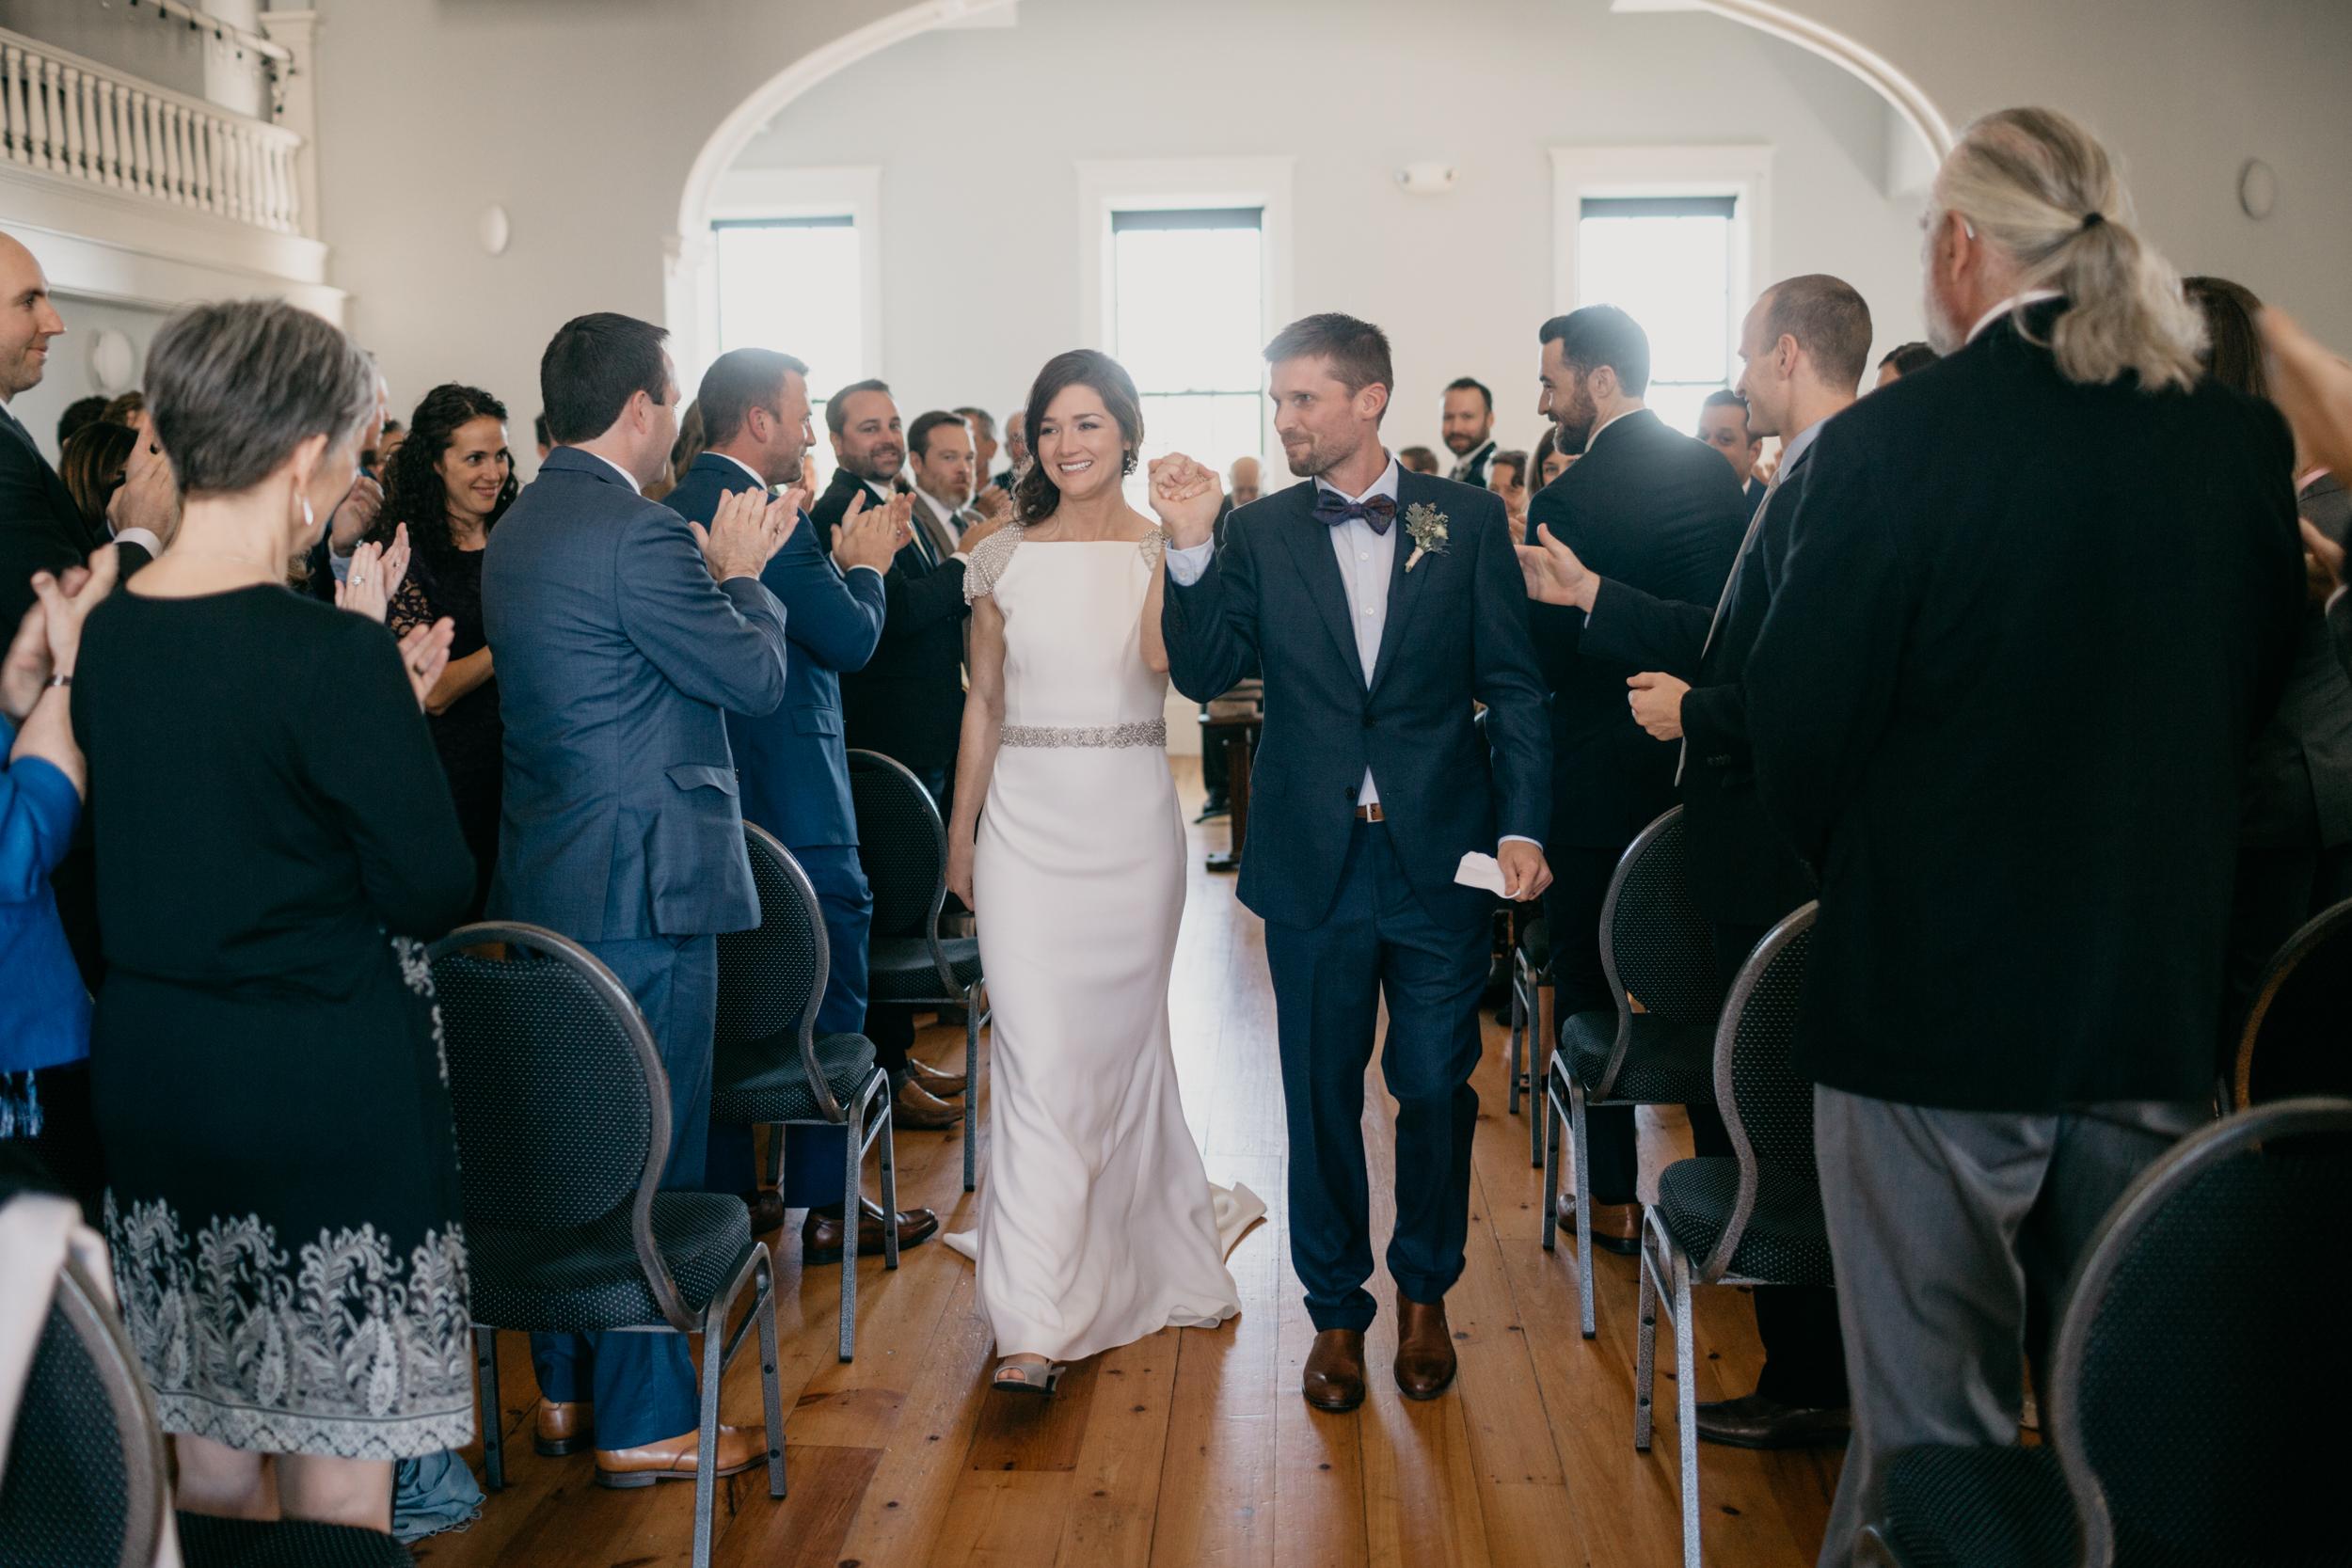 Mackenzie_Collins_Maine_wedding_in_Rockport_Union_hall_Nina_June_016.jpg